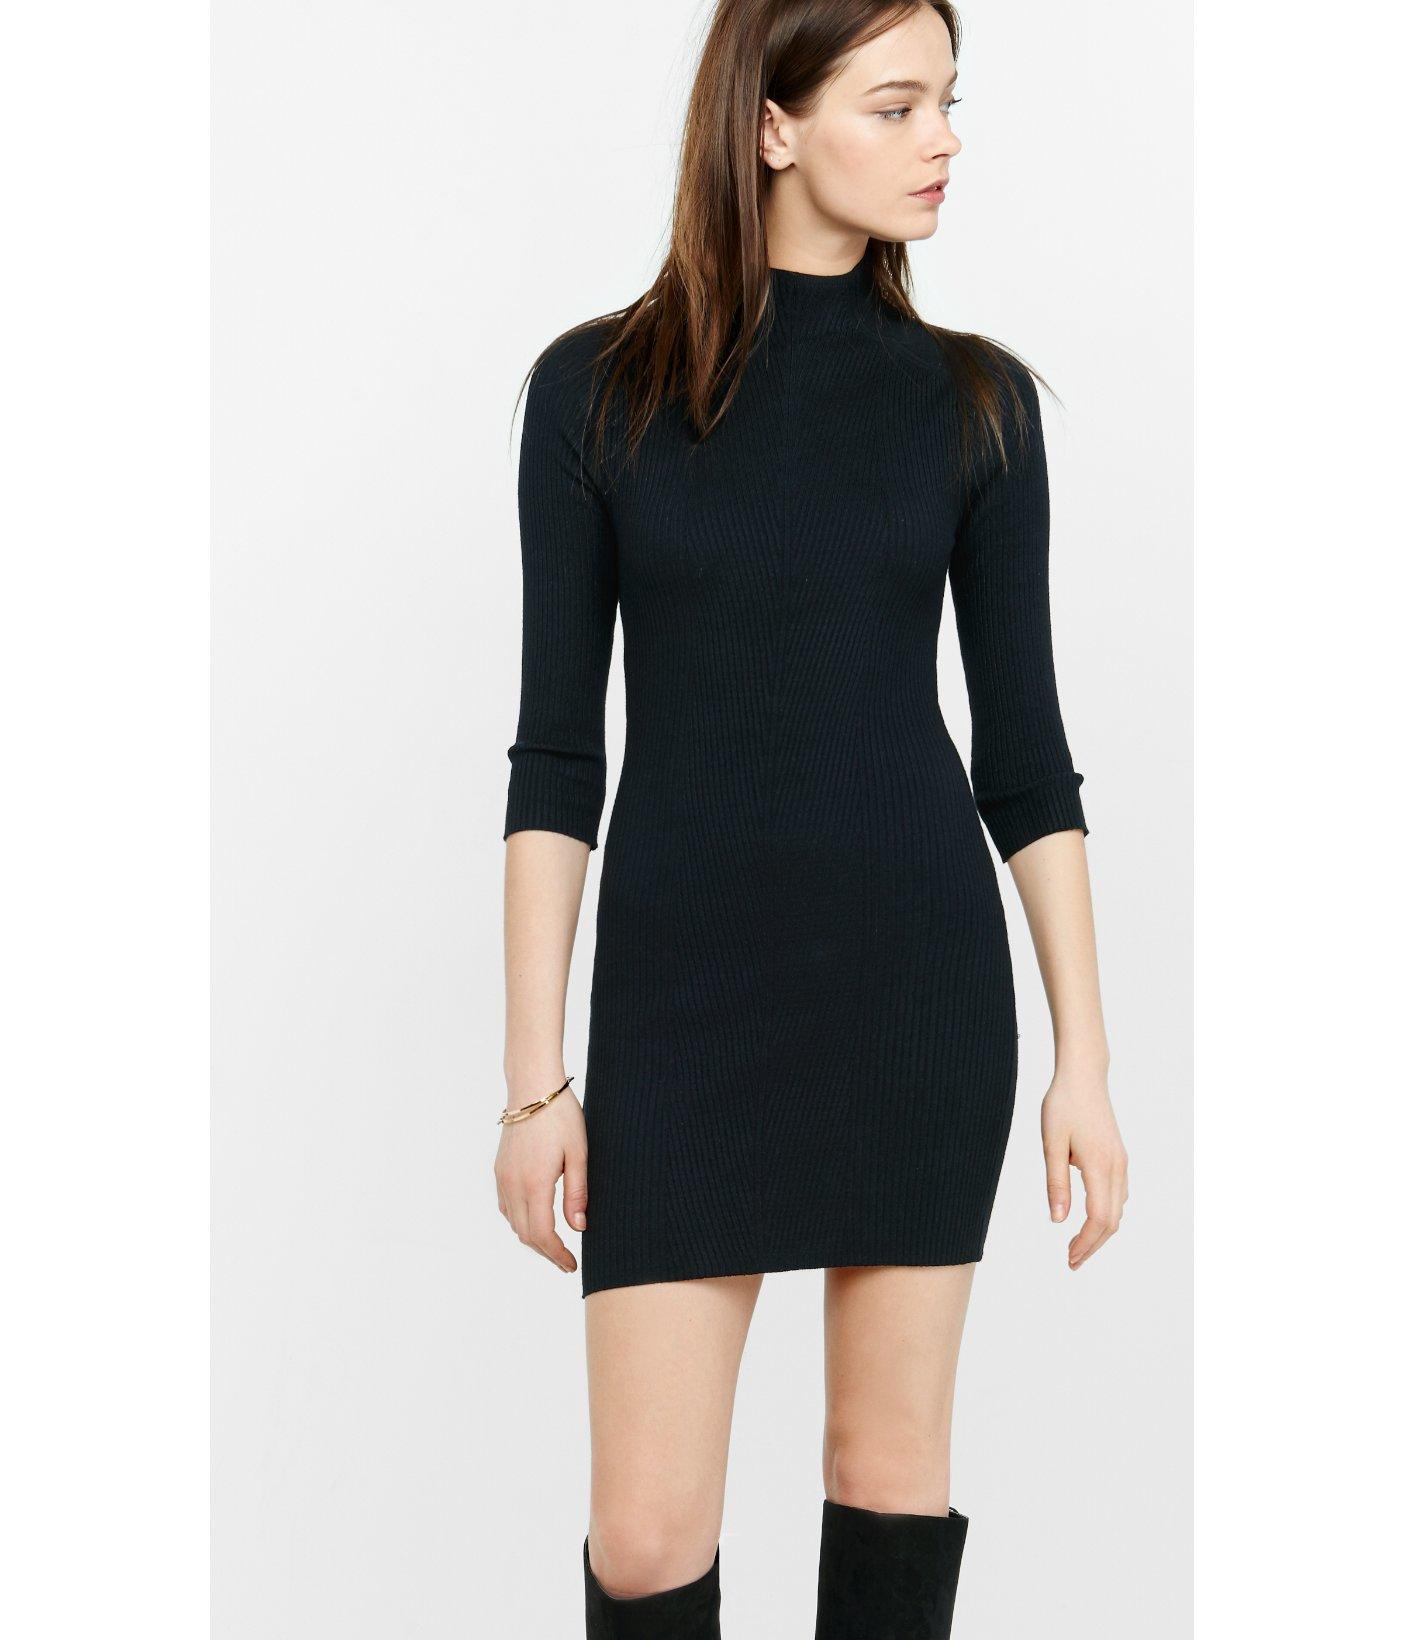 2b655df0e5 Lyst - Express Mock Neck Engineered Rib Sweater Dress in Black